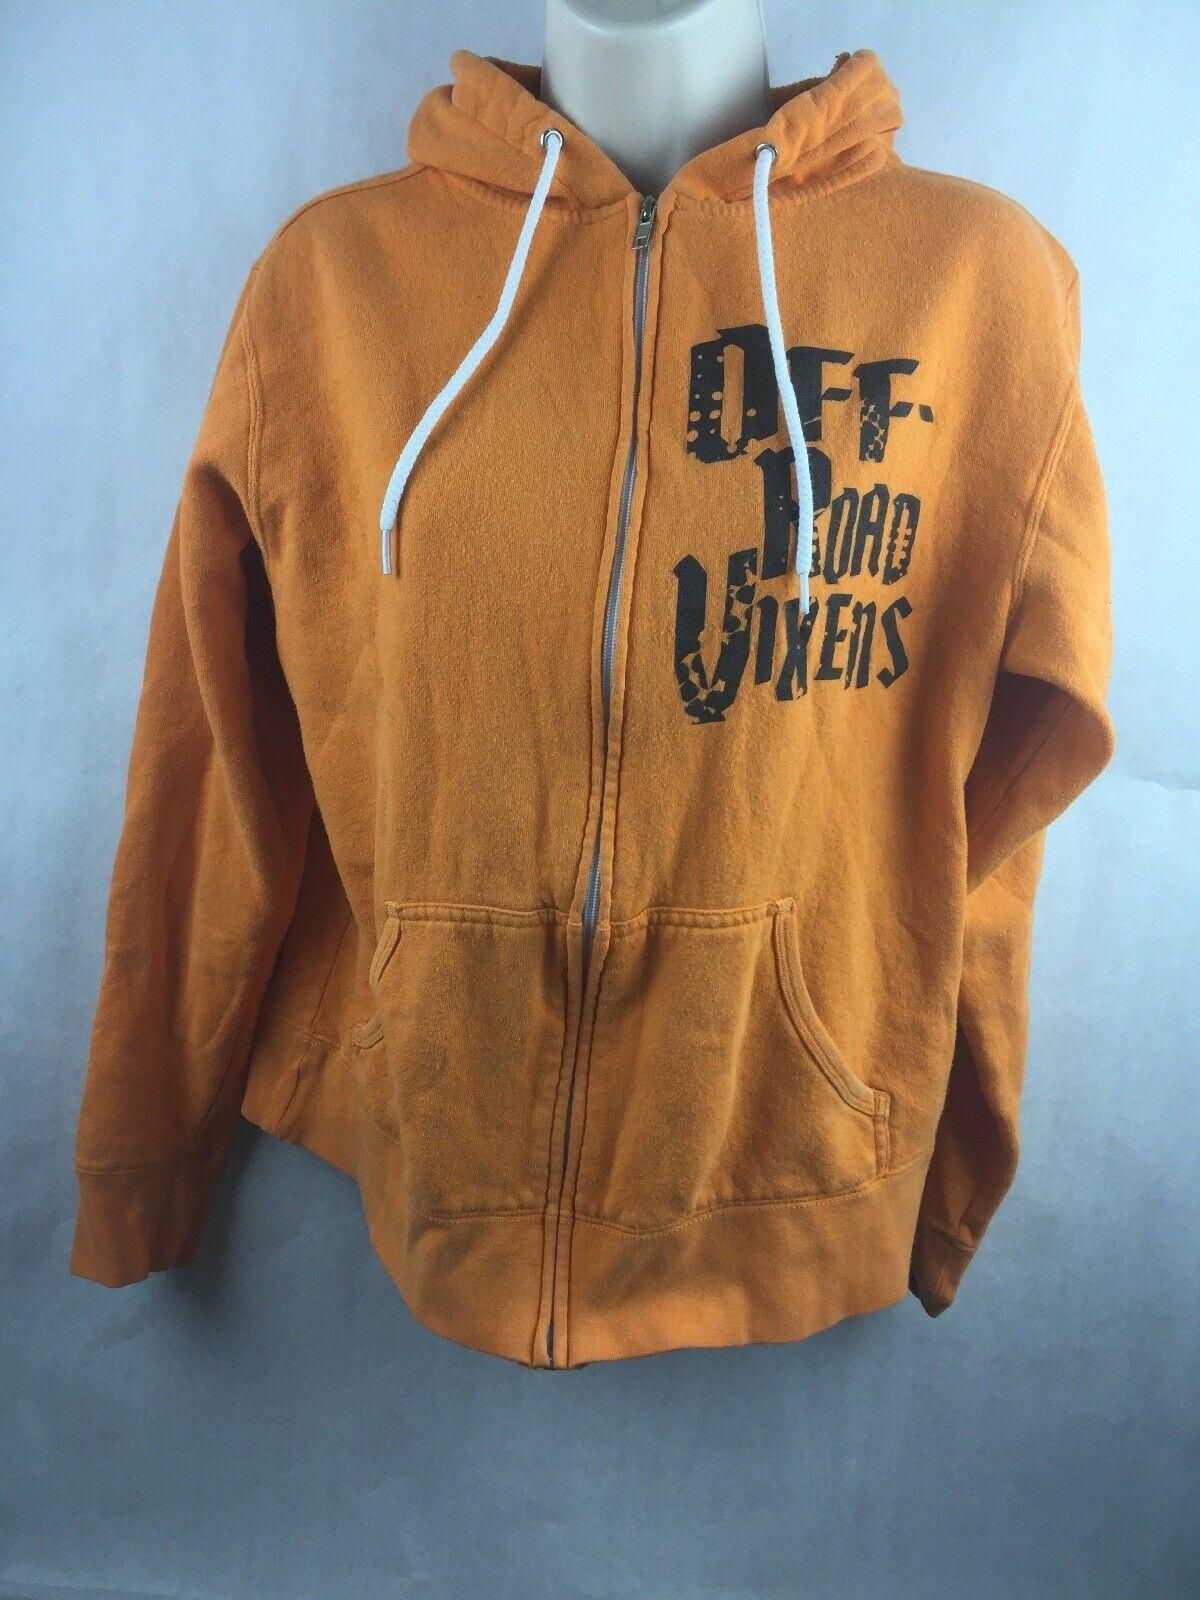 Off-Road Vixens Cotton Poly Orange Hooded Zipper Sweatshirt Size M